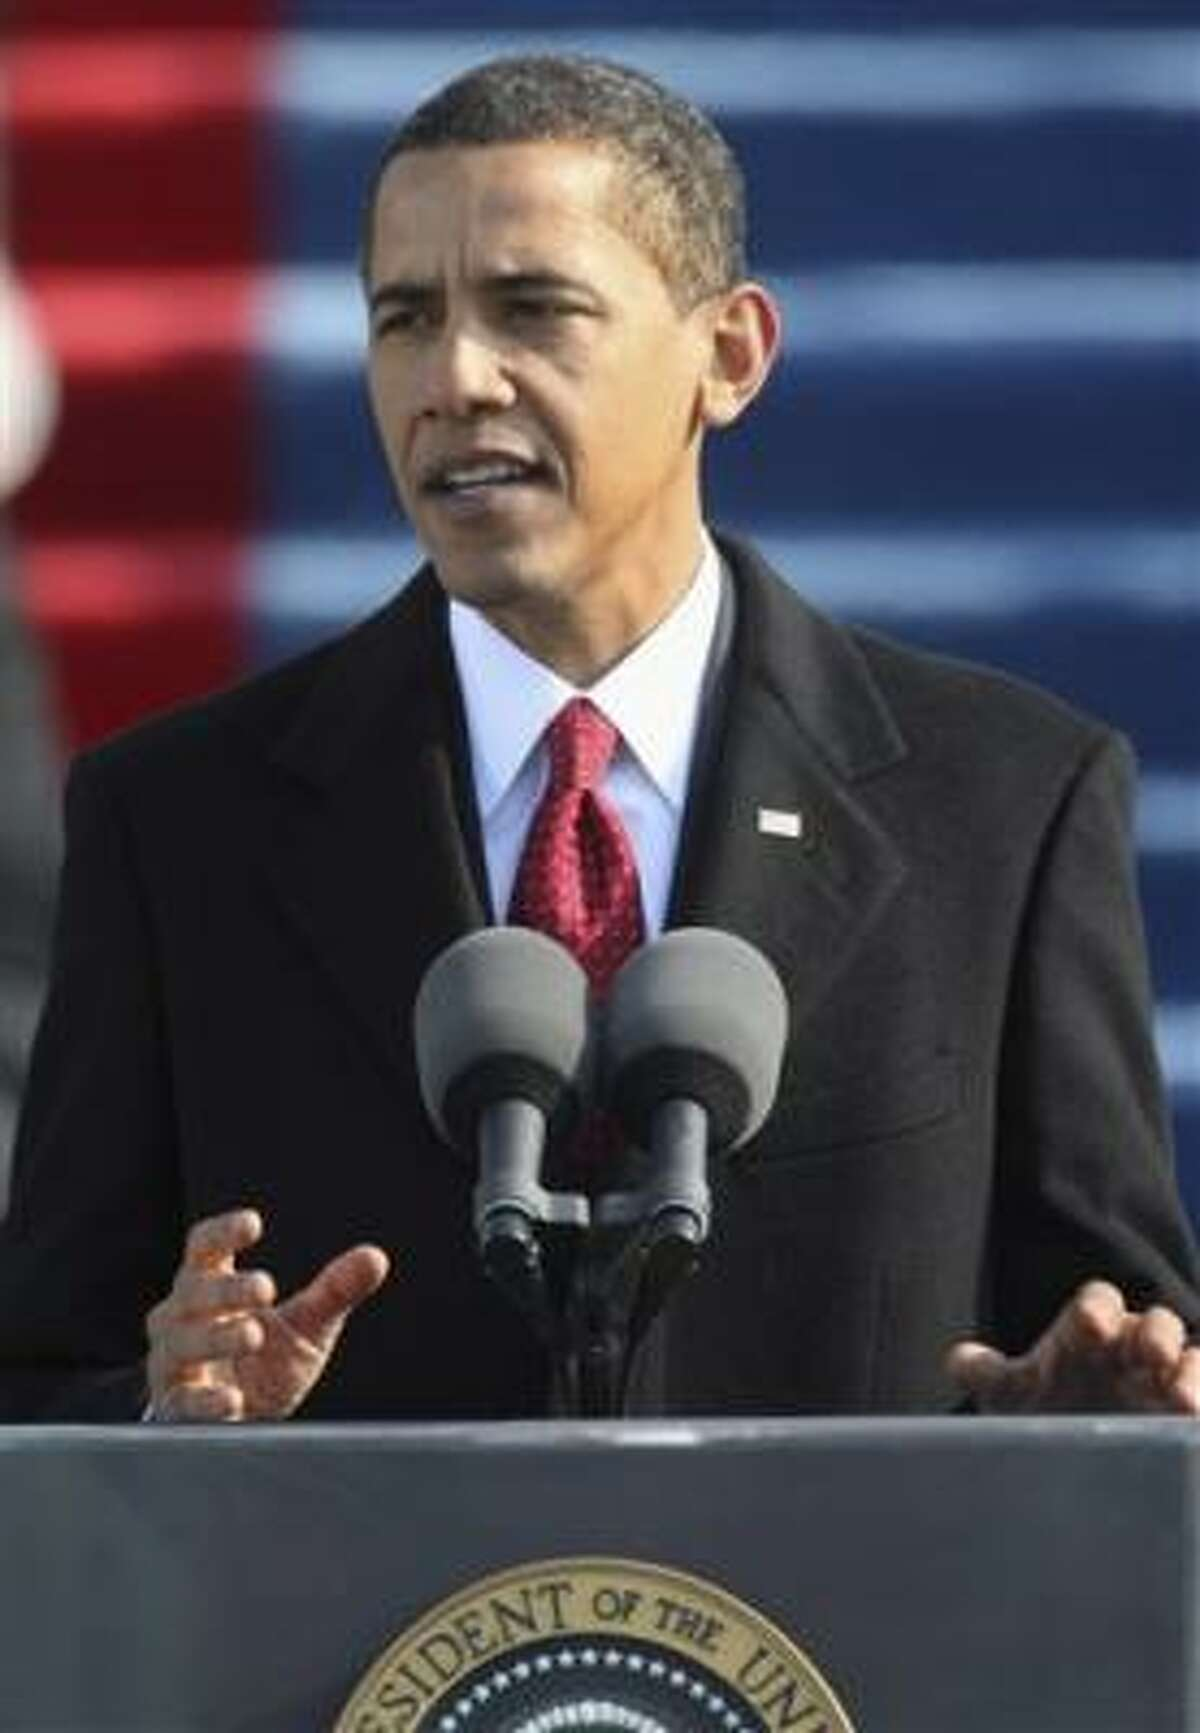 Barack Obama ofrece su primer discurso como presidente de Estados Unidos.